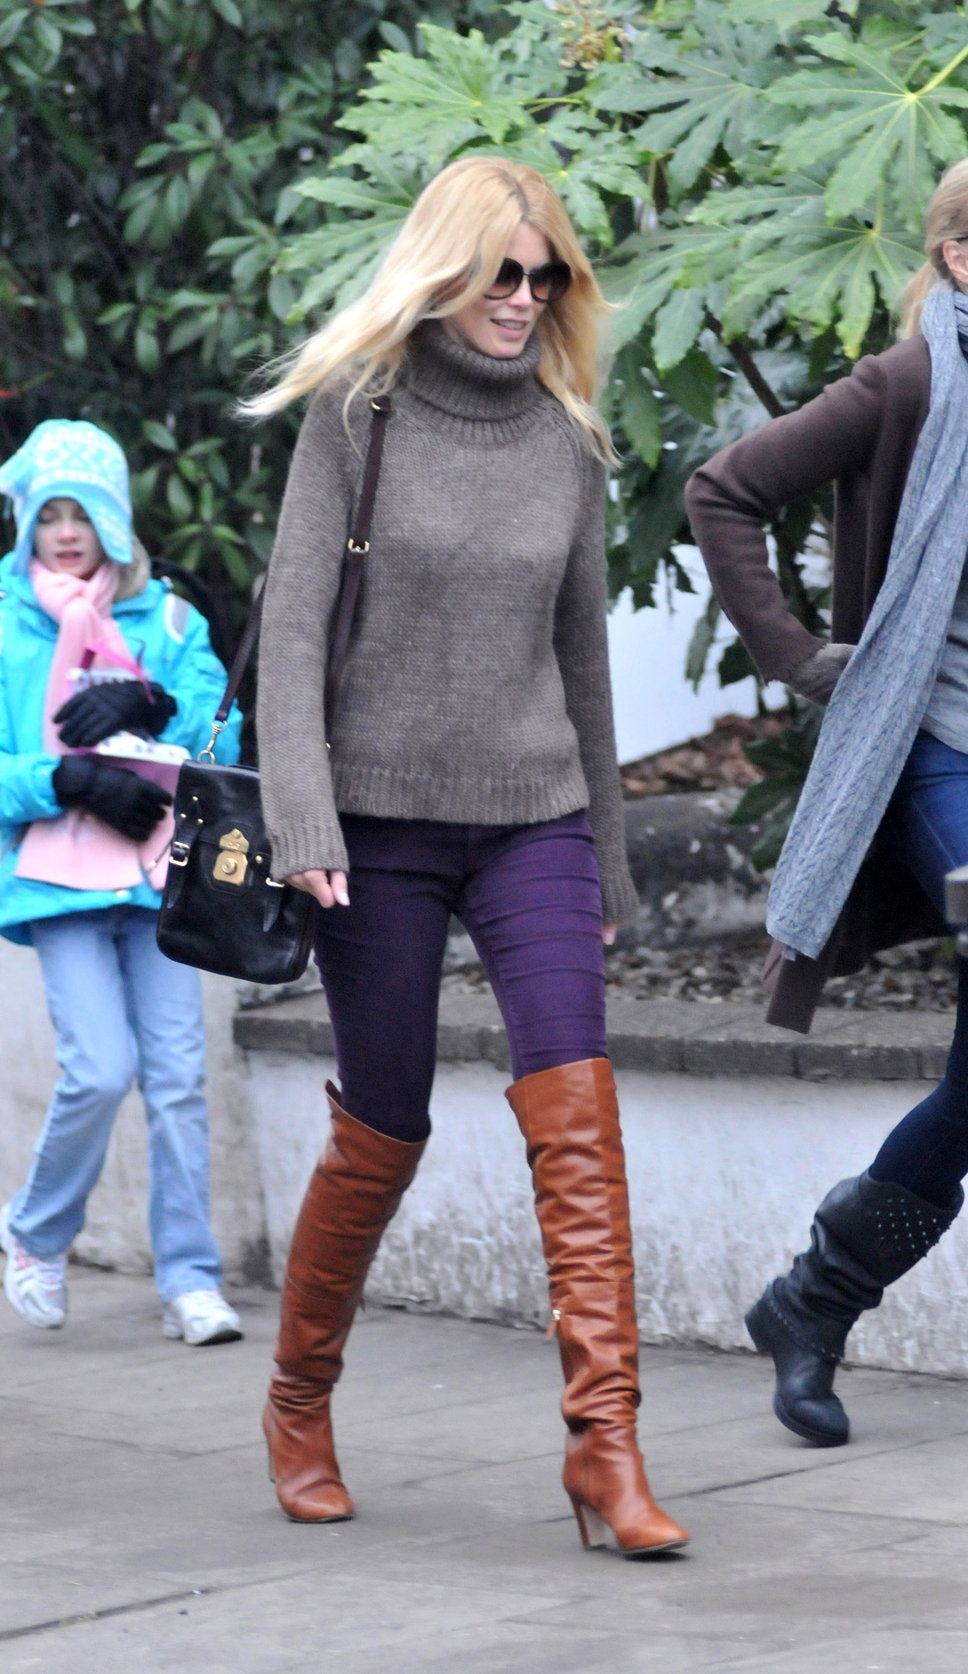 Claudia Schiffer  http://photos.posh24.com/p/1518891/z/fashion_pictures/claudia_schiffer_purple_pants.jpg